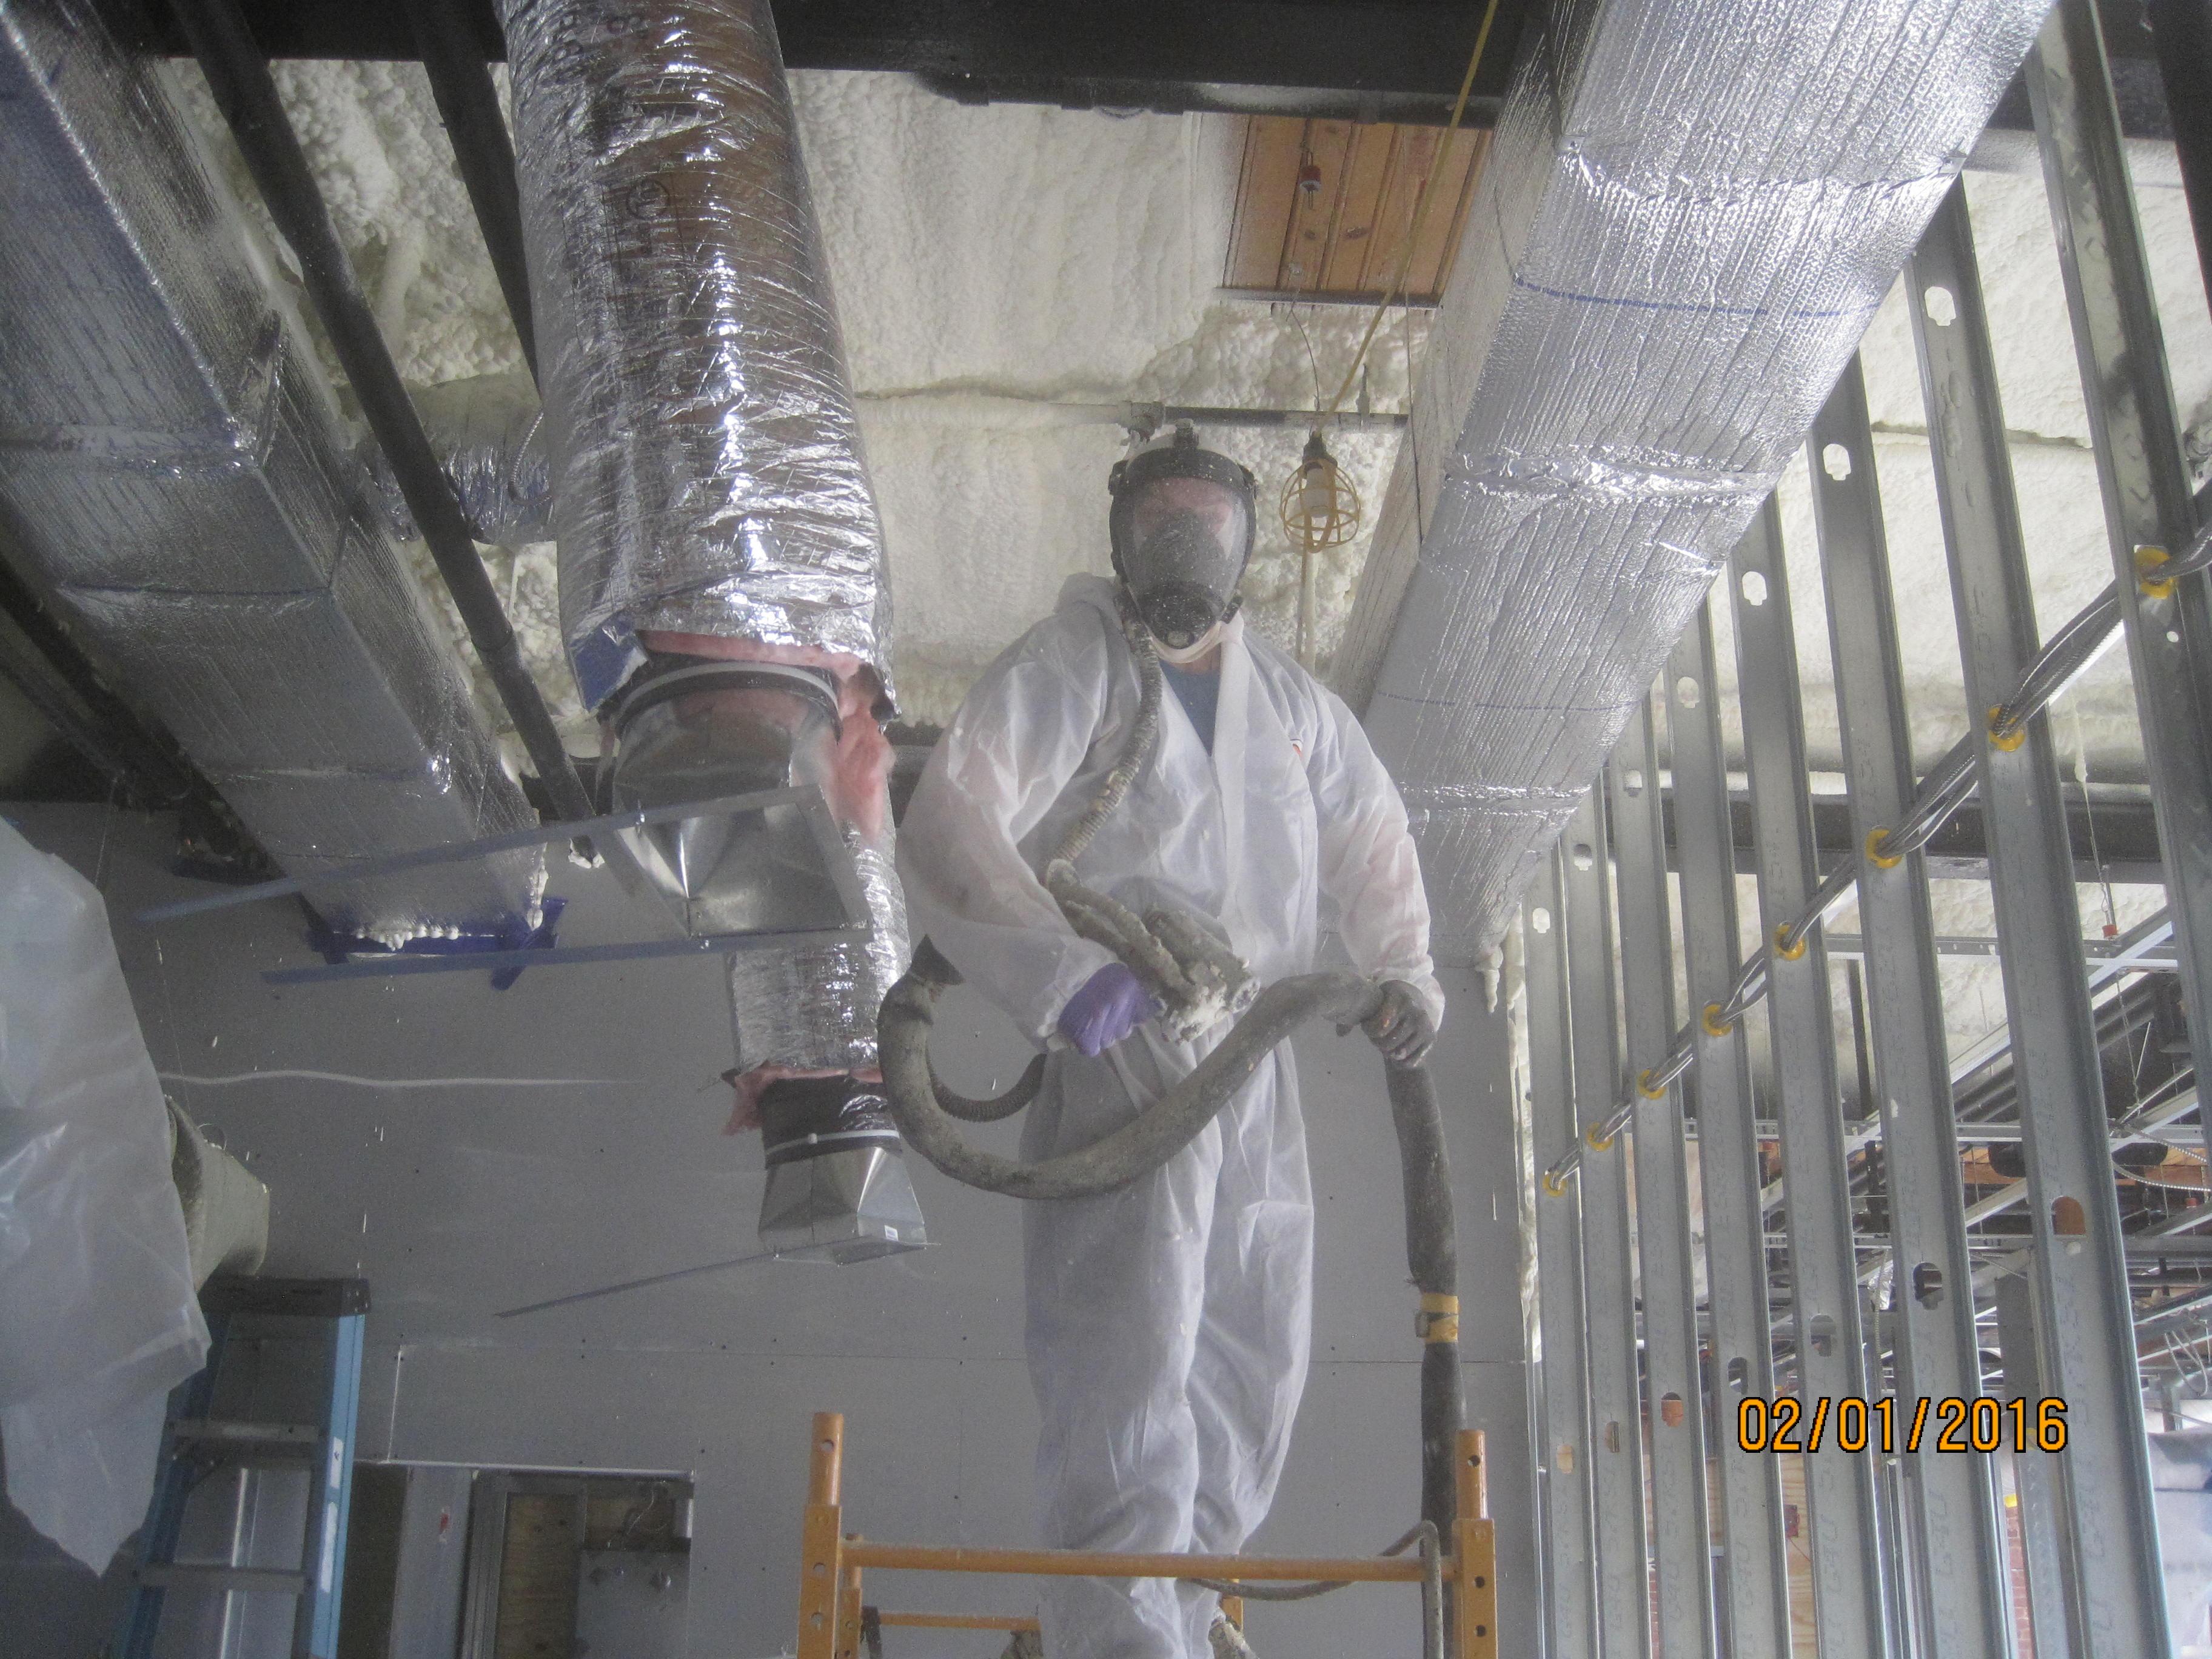 Commercial spray foam insulation